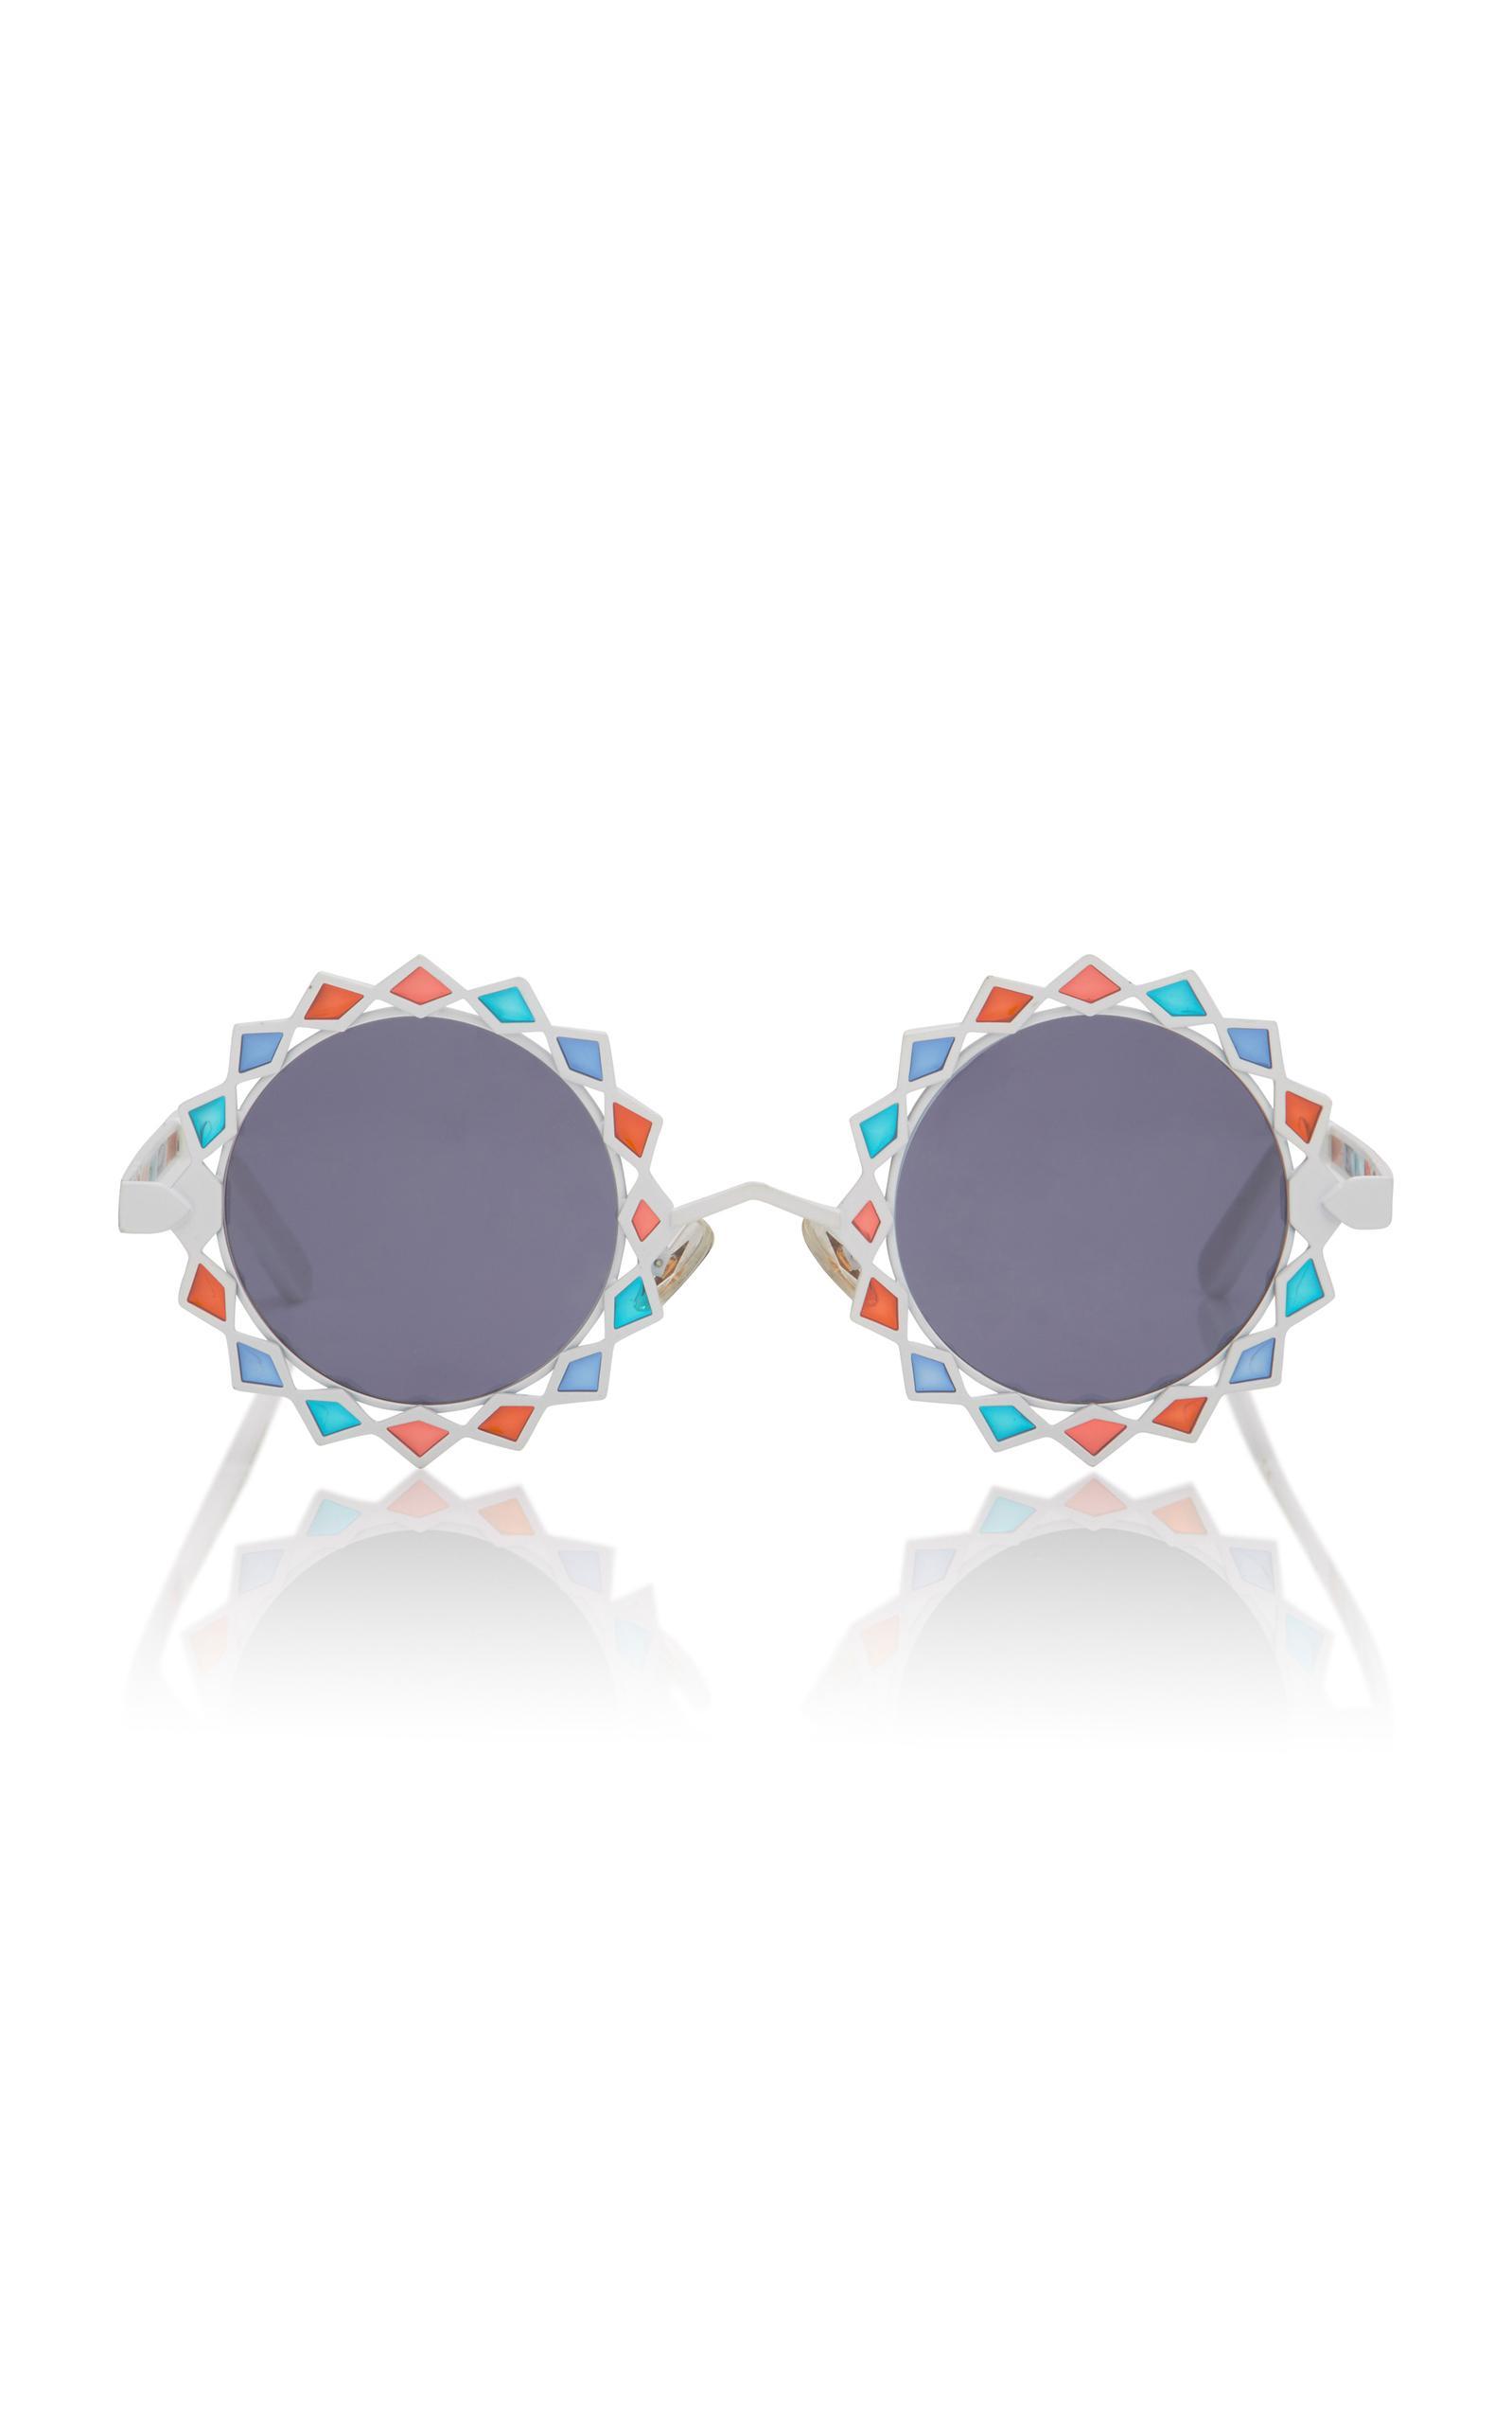 Lyst - Pared Eyewear Moon & Stars Acetate Round-frame Sunglasses